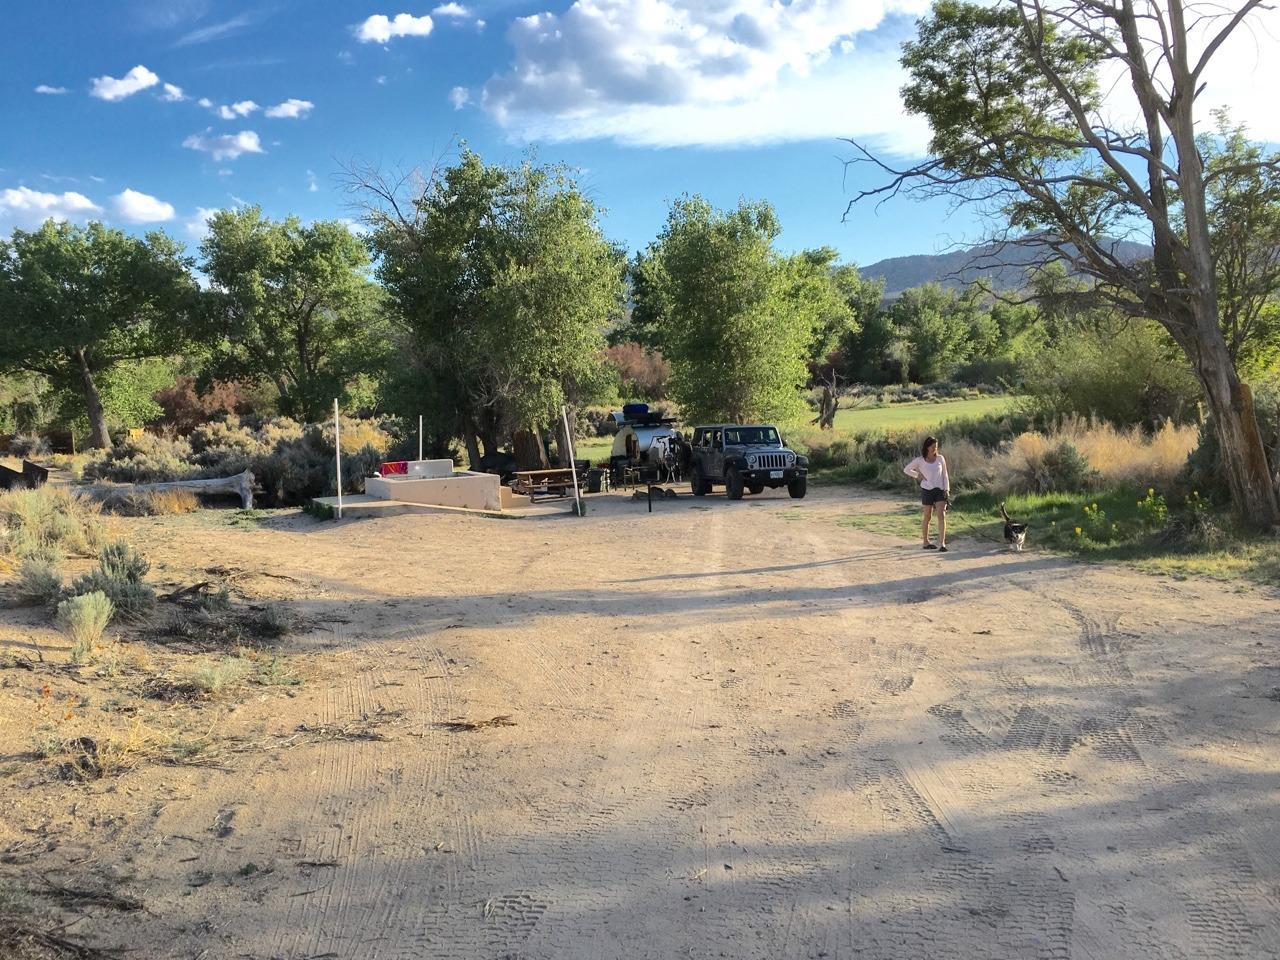 Our campsite in Benton Hot Springs